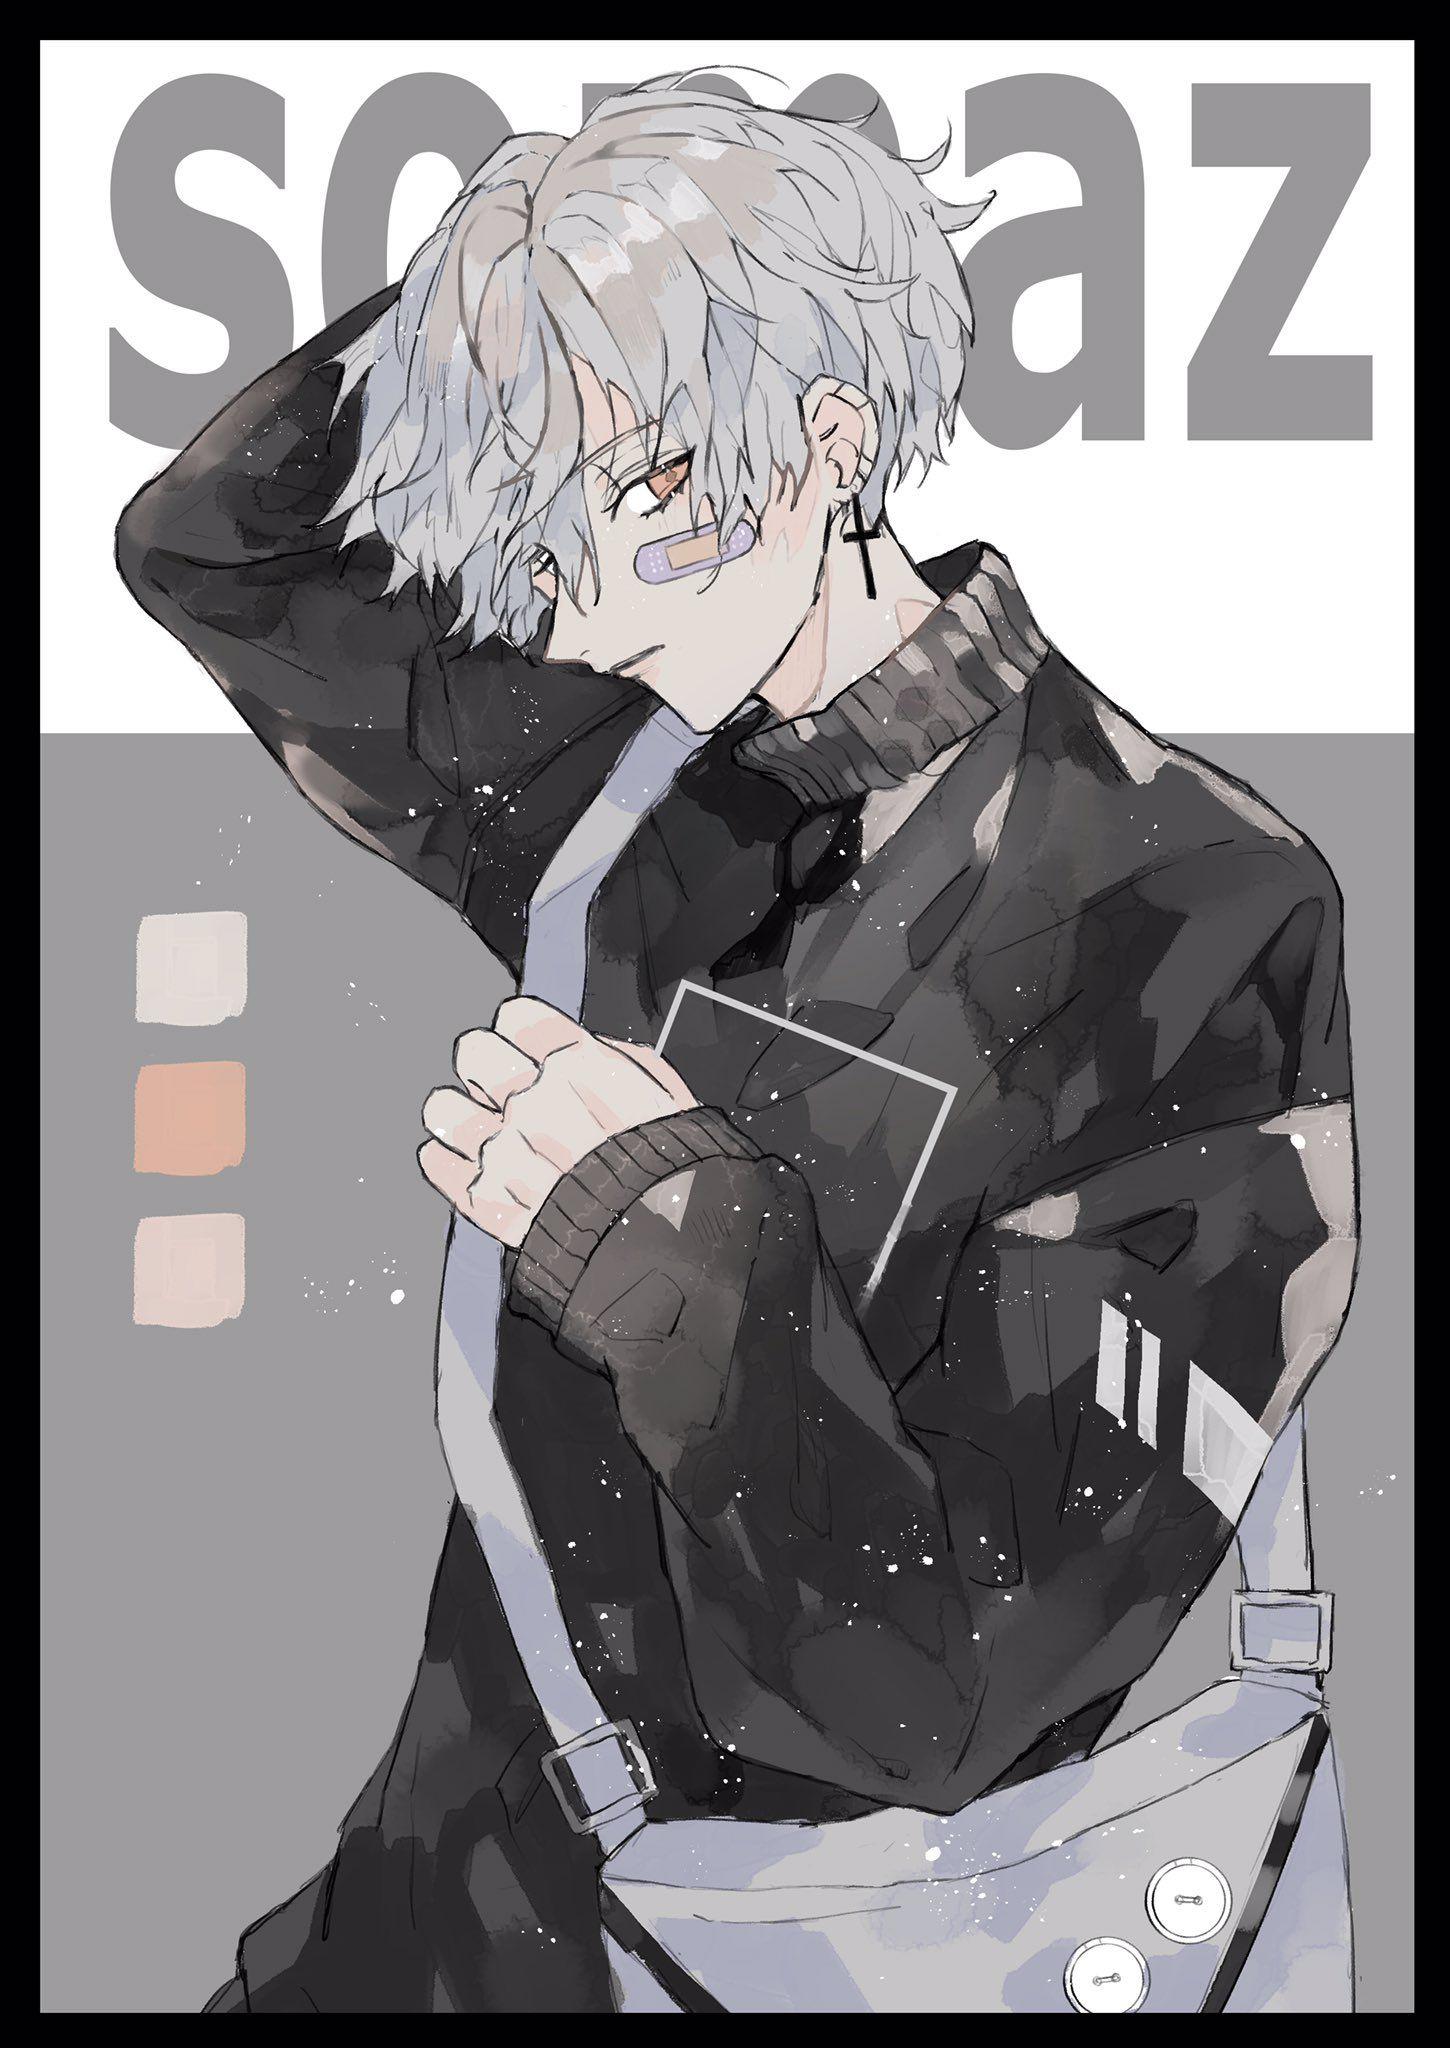 「Somaz」おしゃれまとめの人気アイデア|Pinterest|kio【2020】 イラスト, アニメ 男性